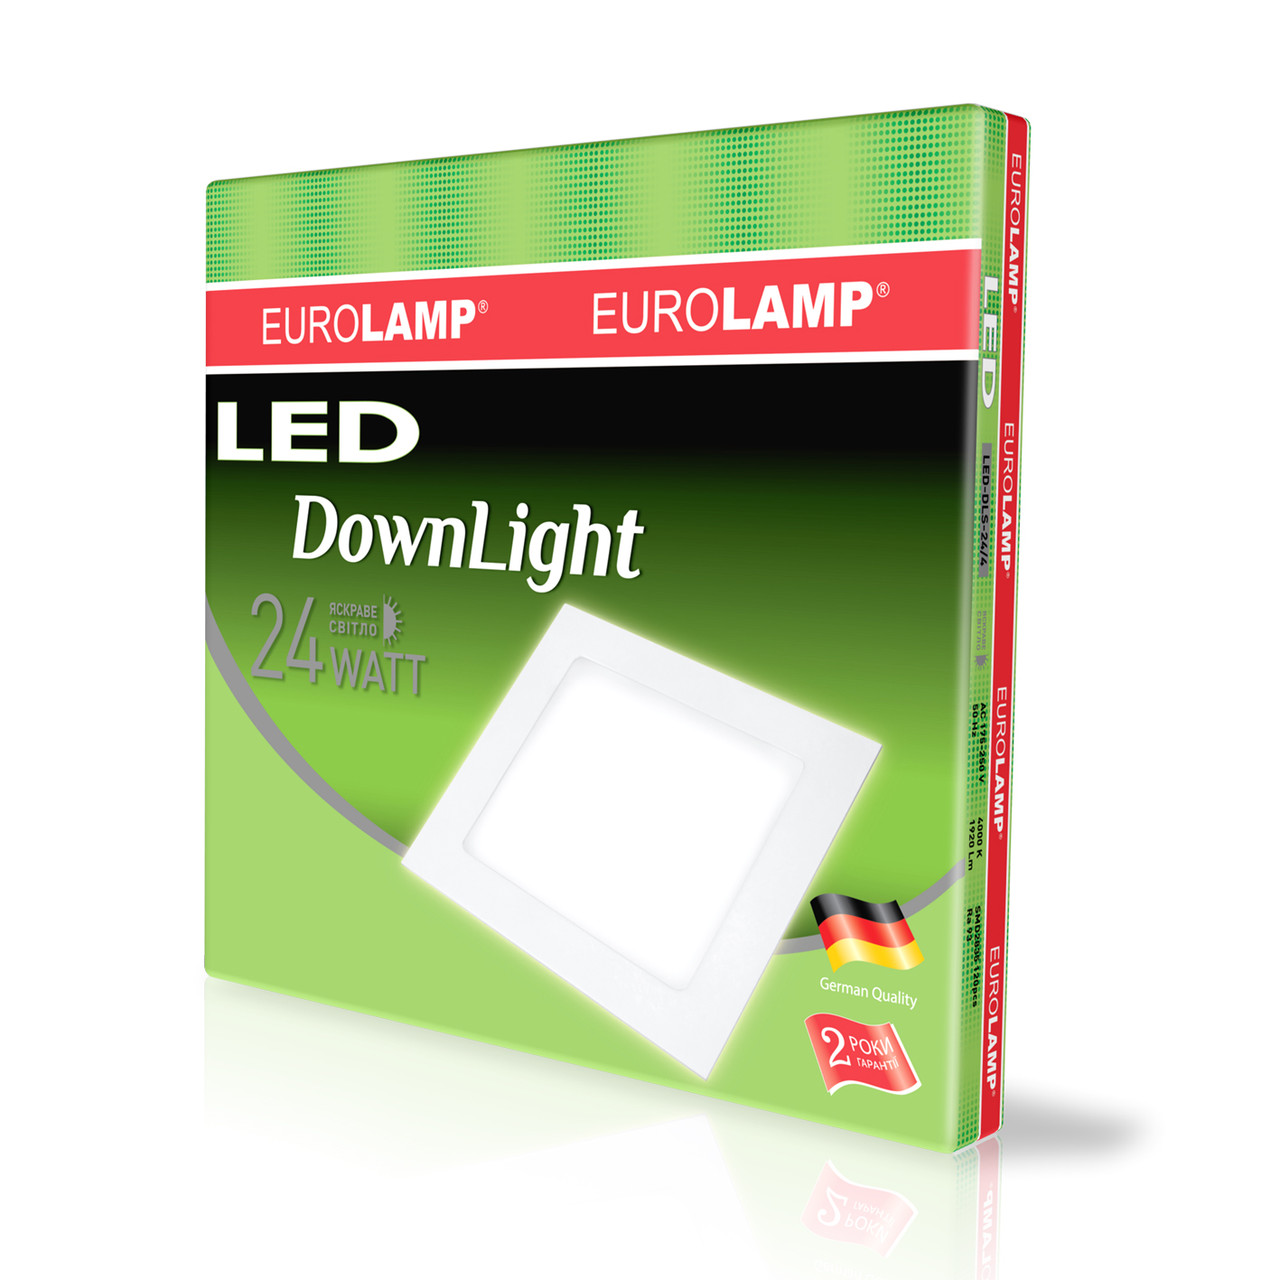 EUROLAMP LED Светильник квадратный Downlight 24W 4000K 220V